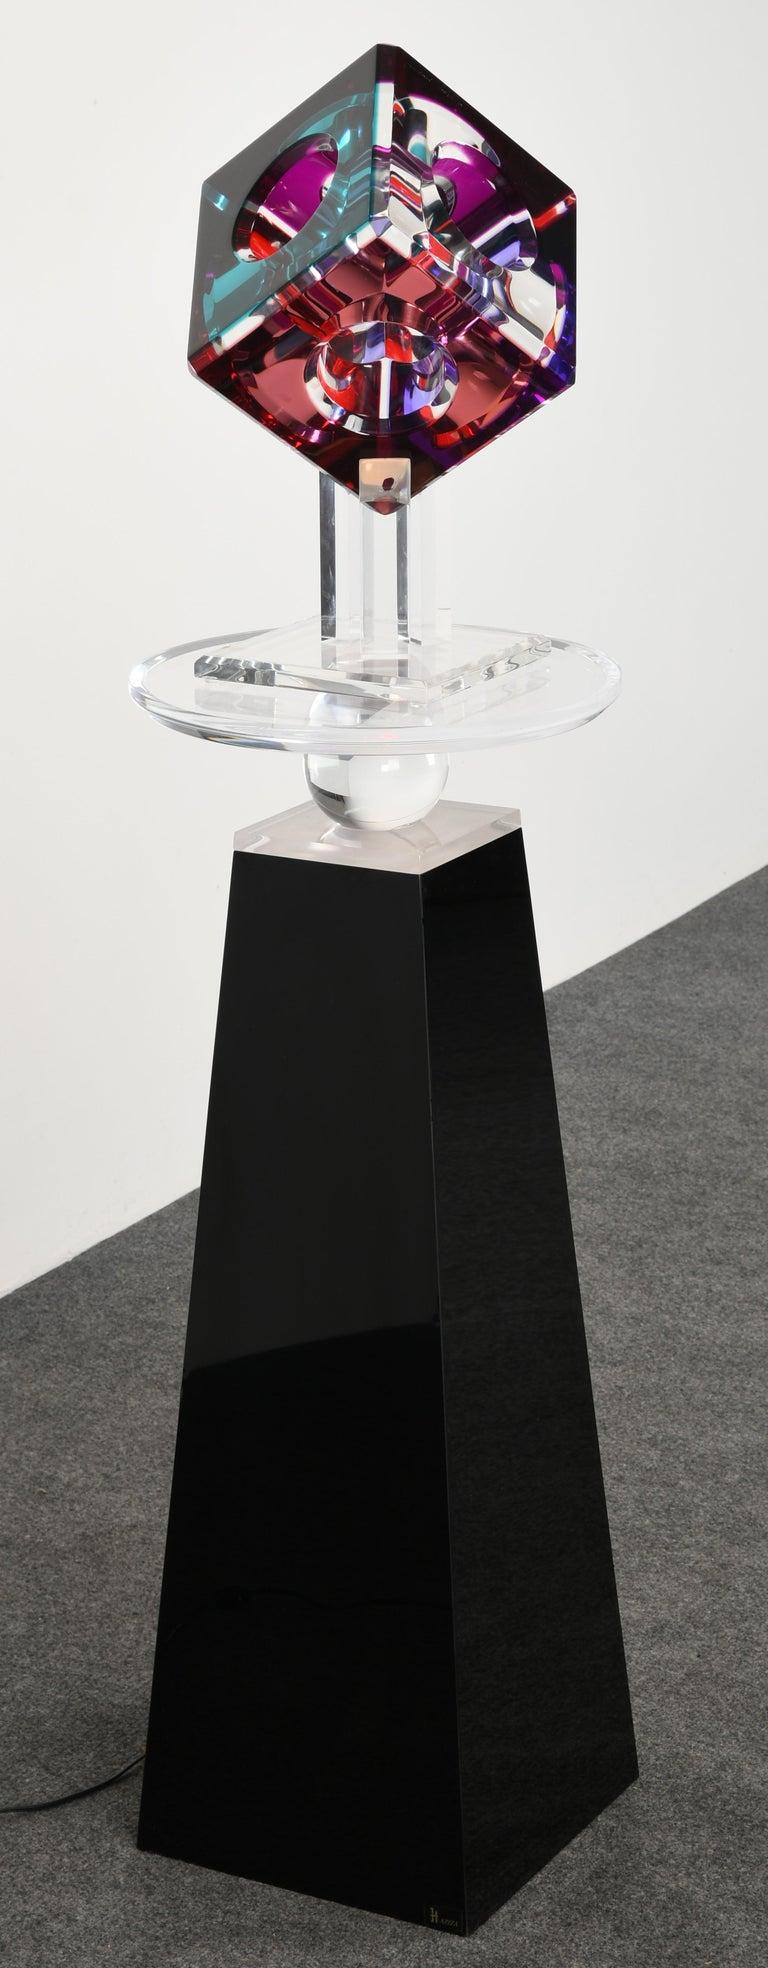 Lucite Sculpture by Shlomi Haziza, 2000s 6